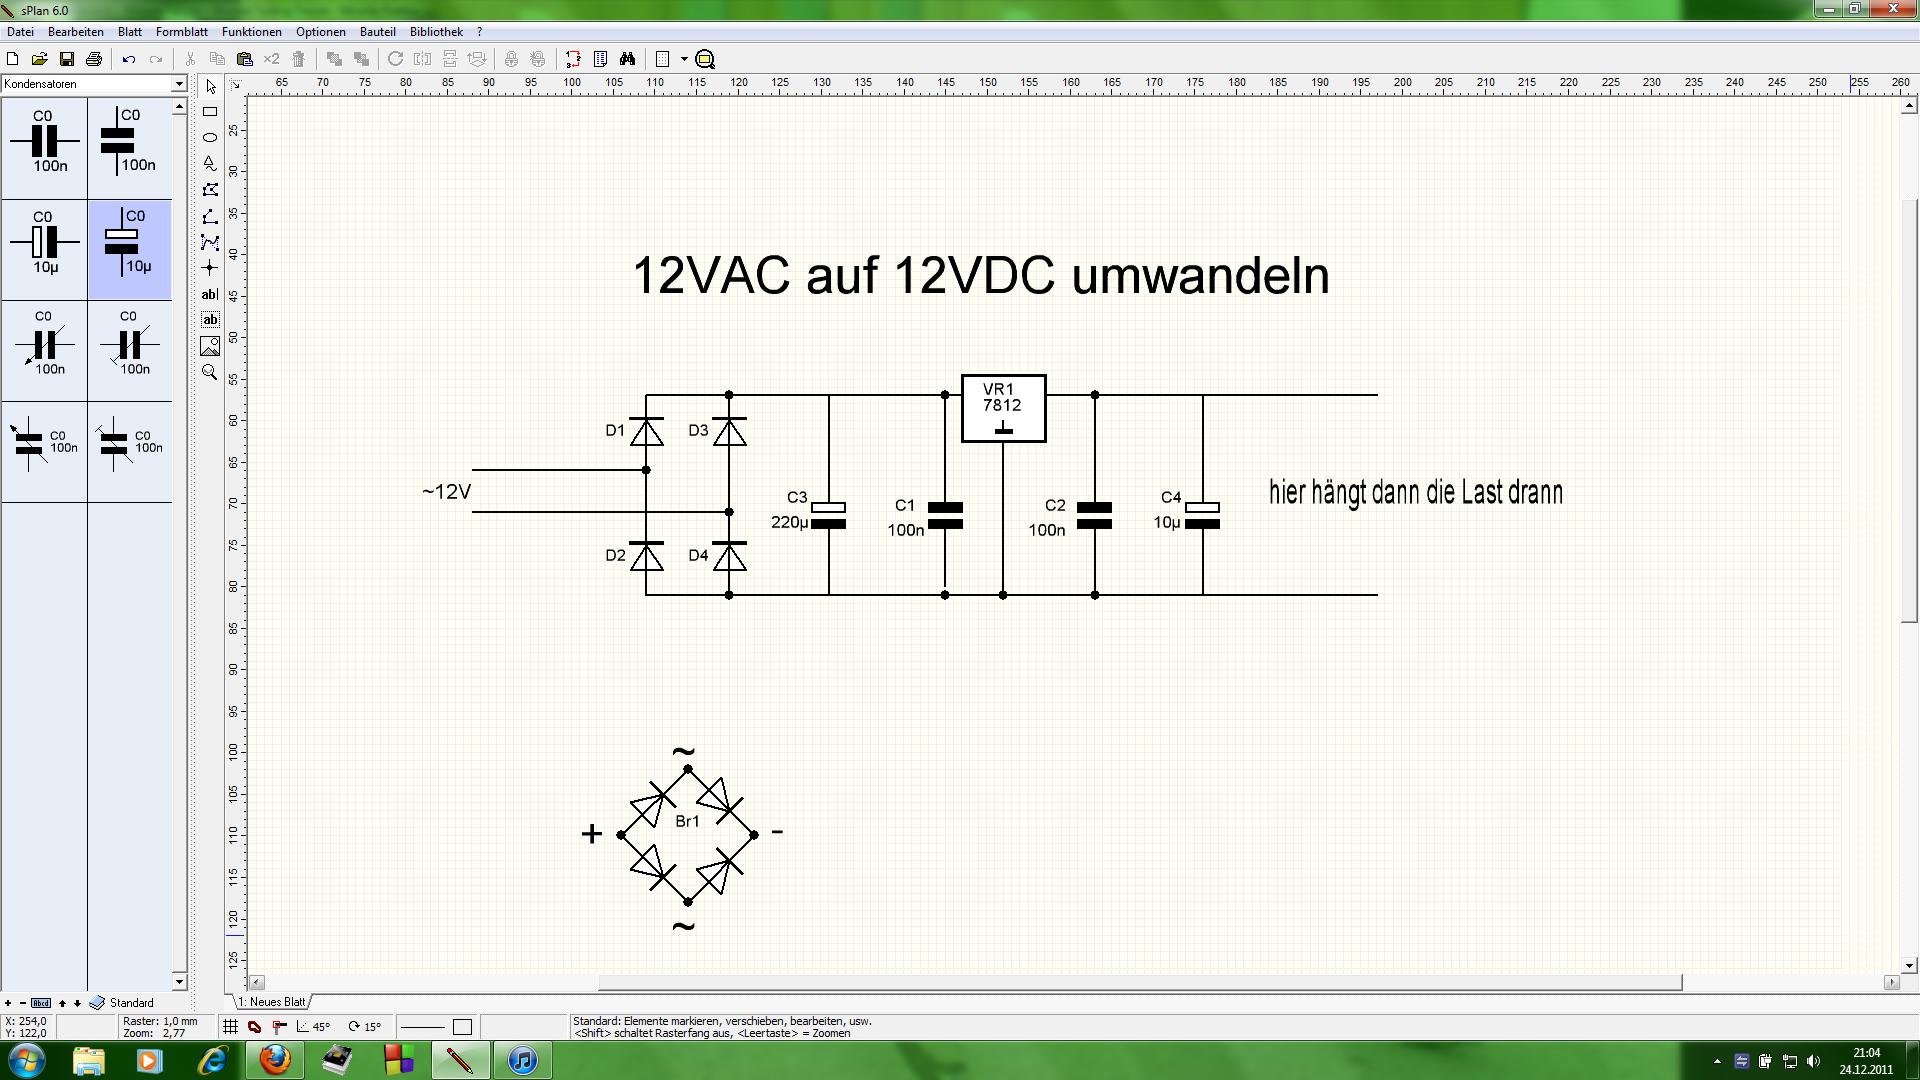 12VAC auf 12VDC umwandeln - Elektronikbereich - 2Stroke-Tuning